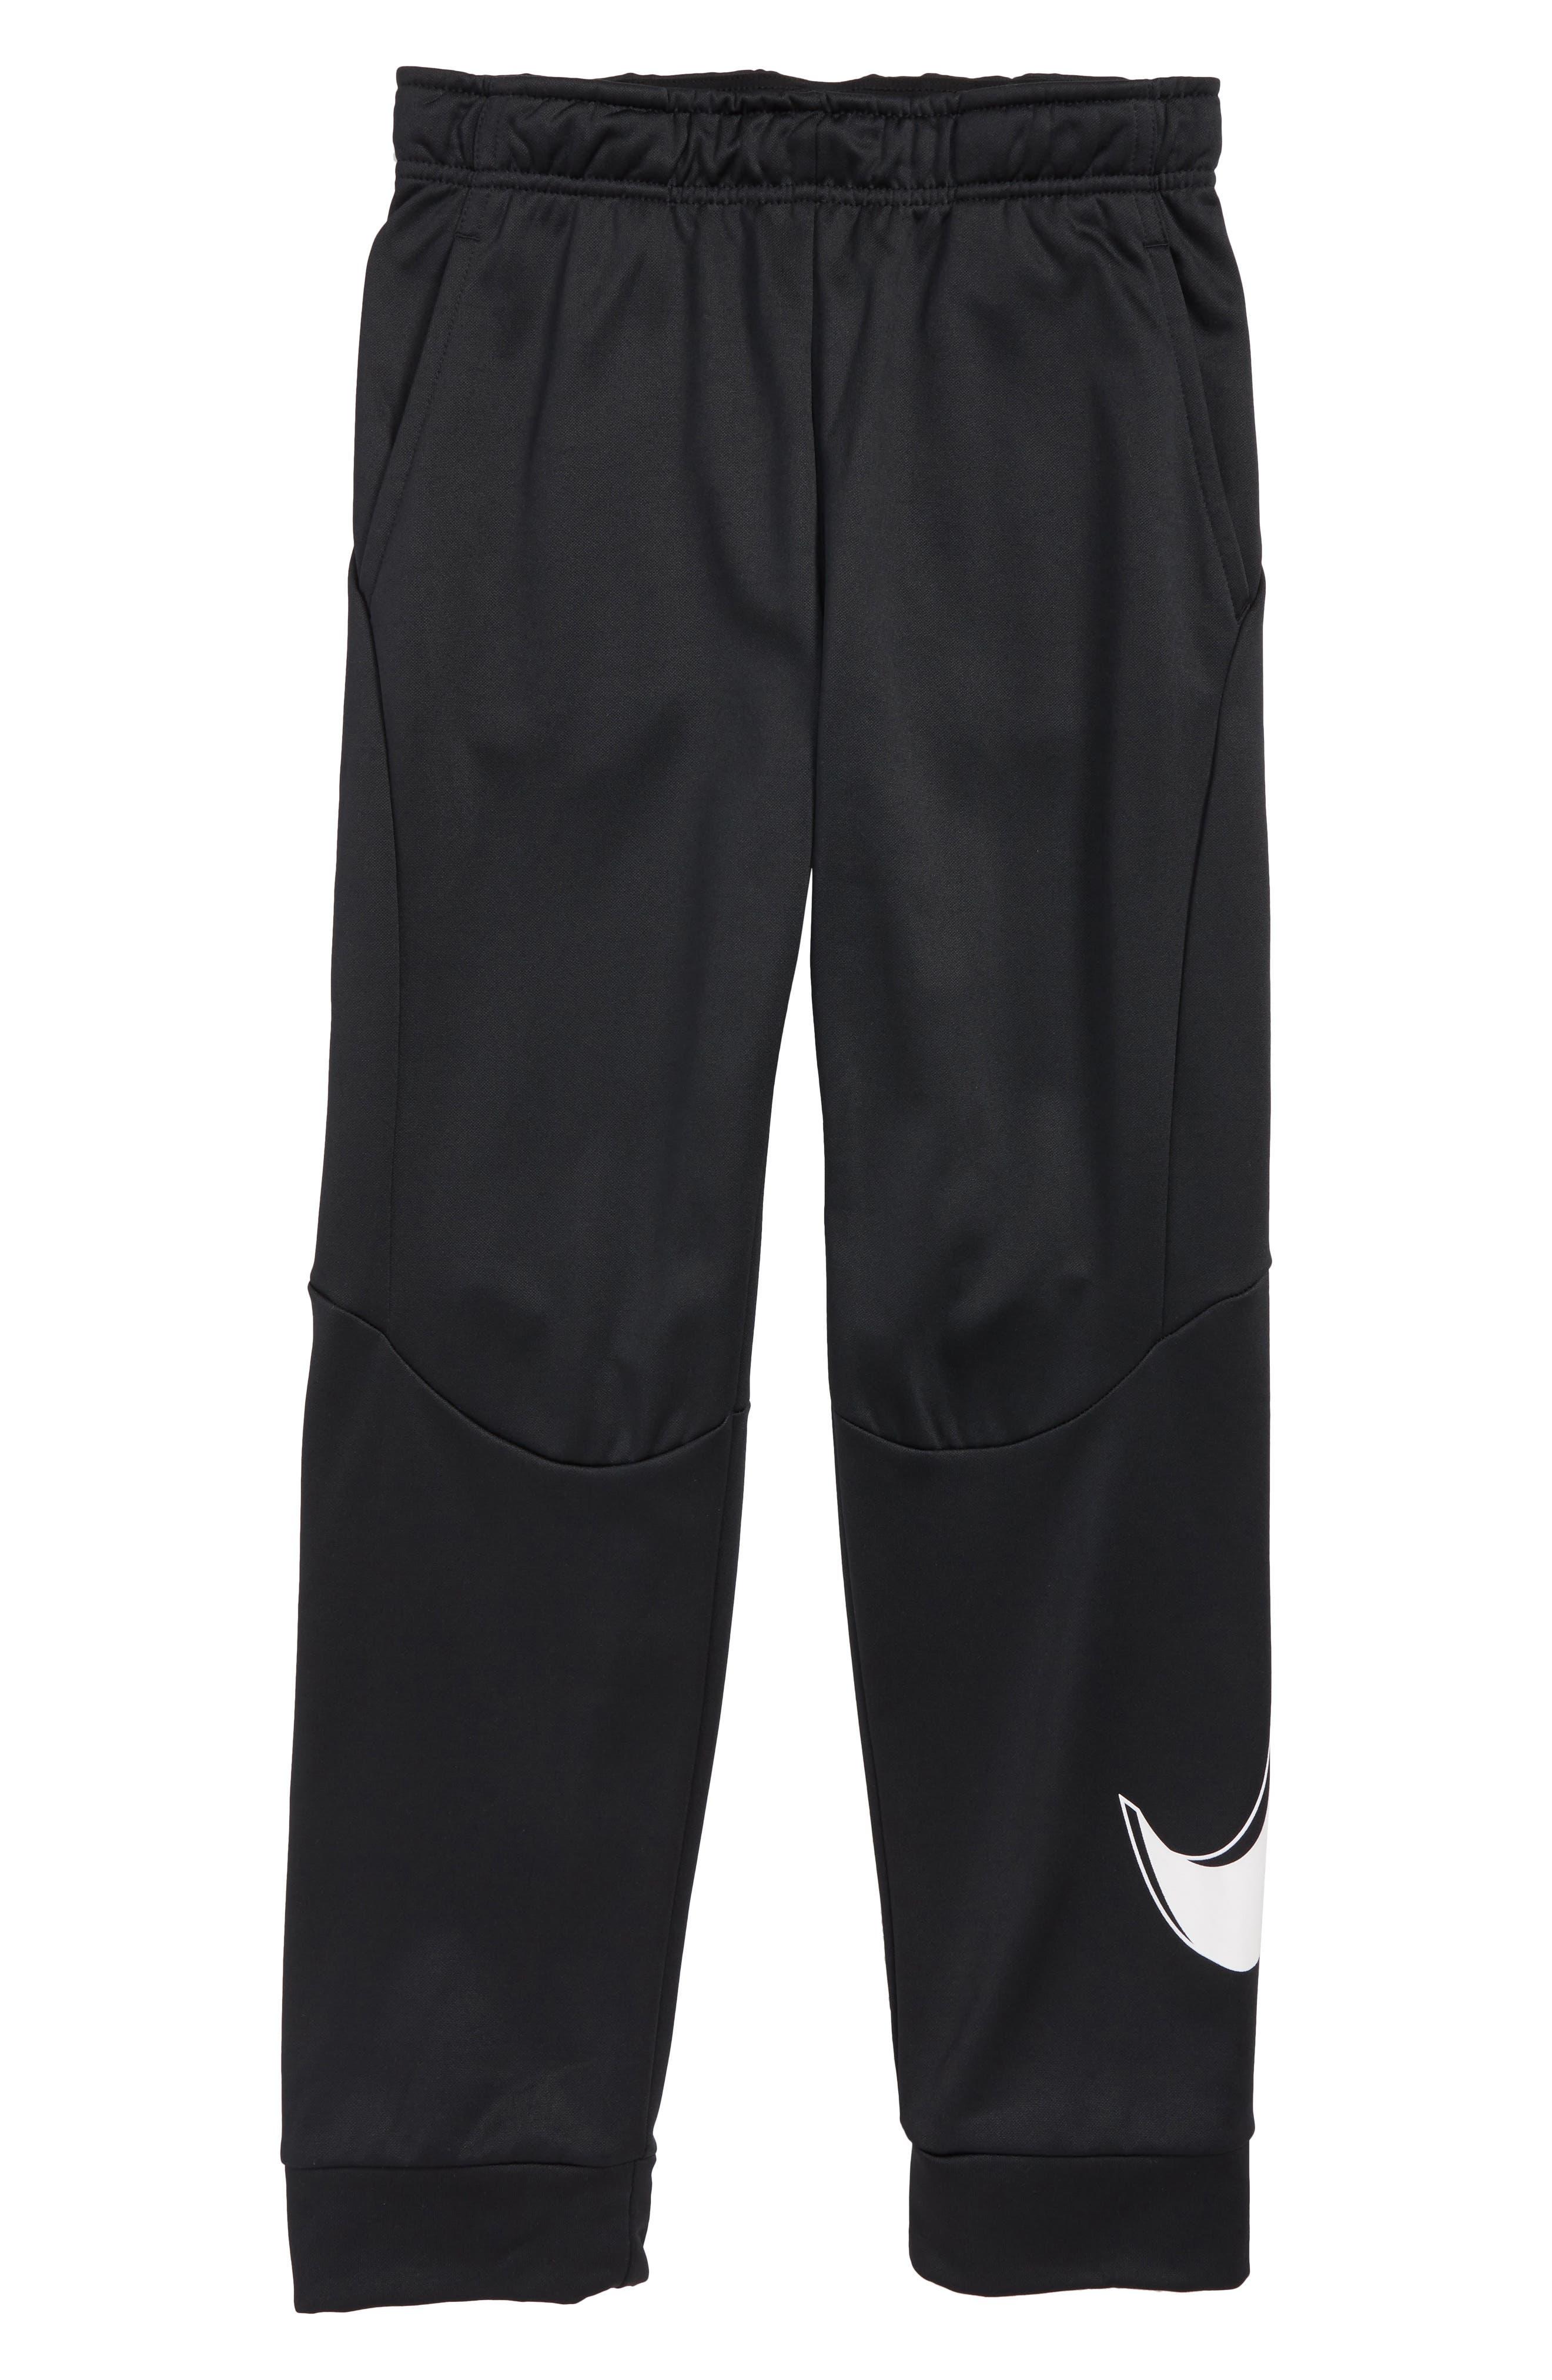 Boys Nike Therma Sweatpants